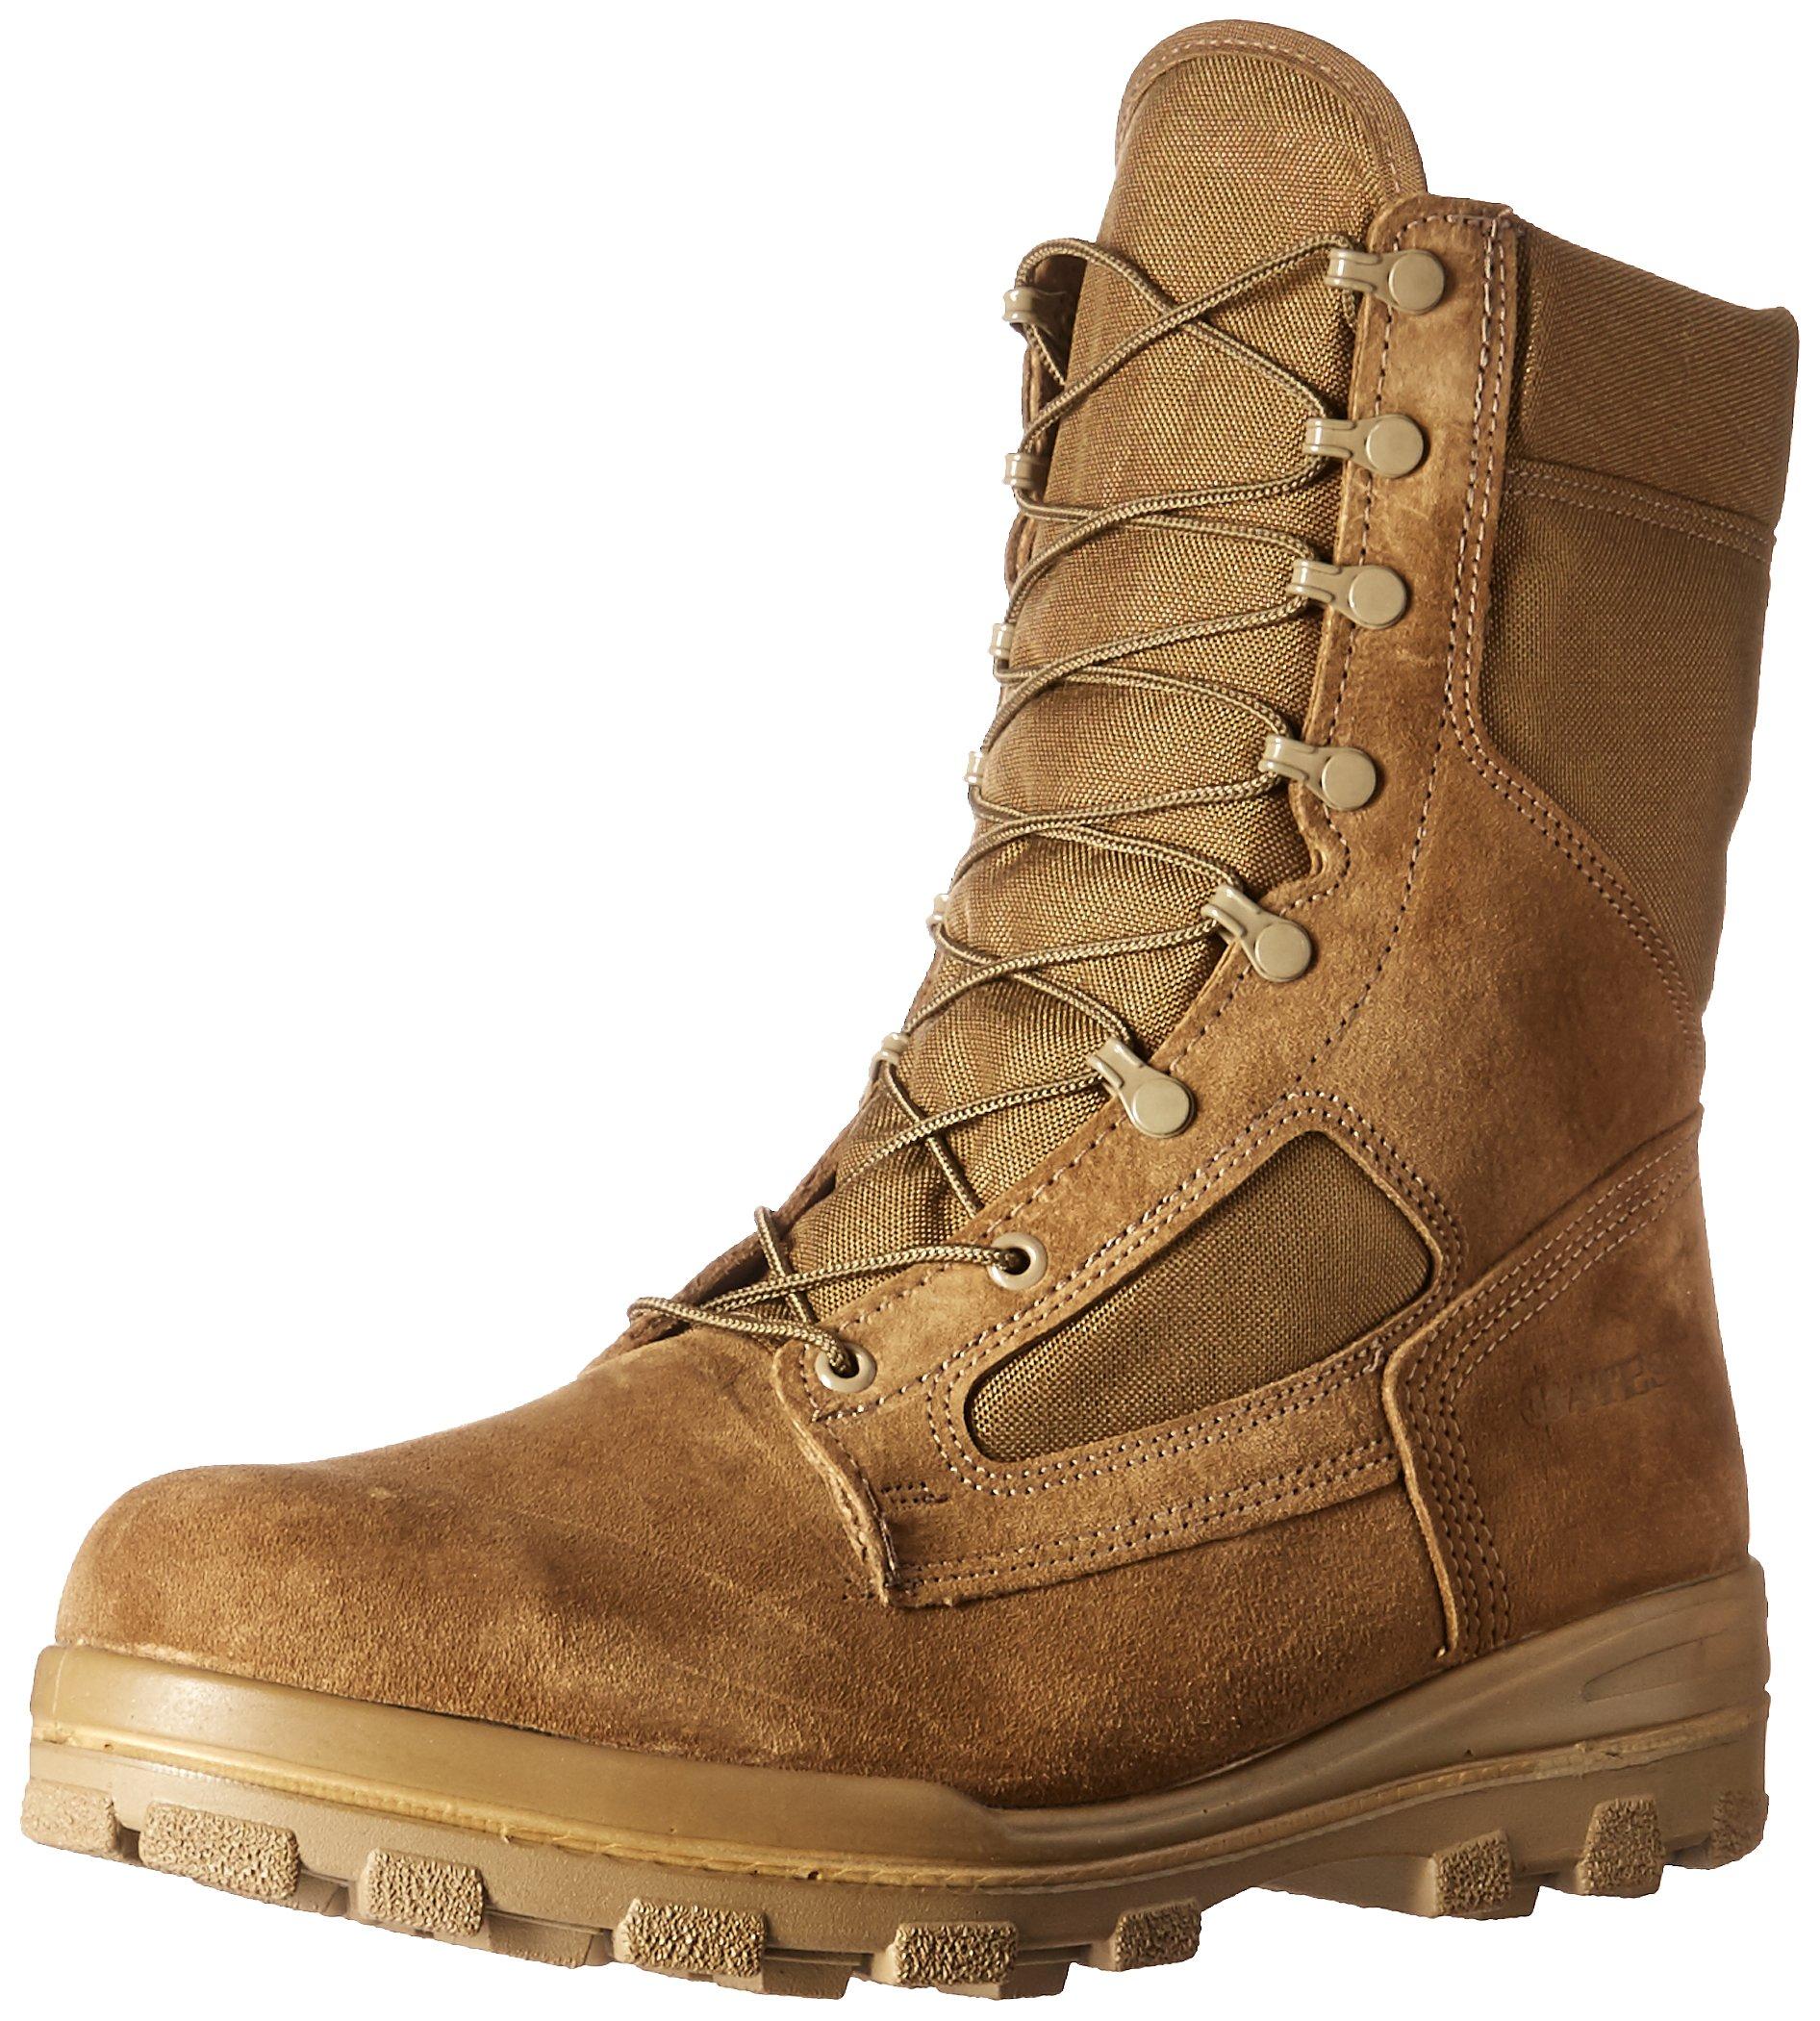 Bates Men's Durashocks Steel Toe Military & Tactical Boot, Olive Mojave, 14 M US